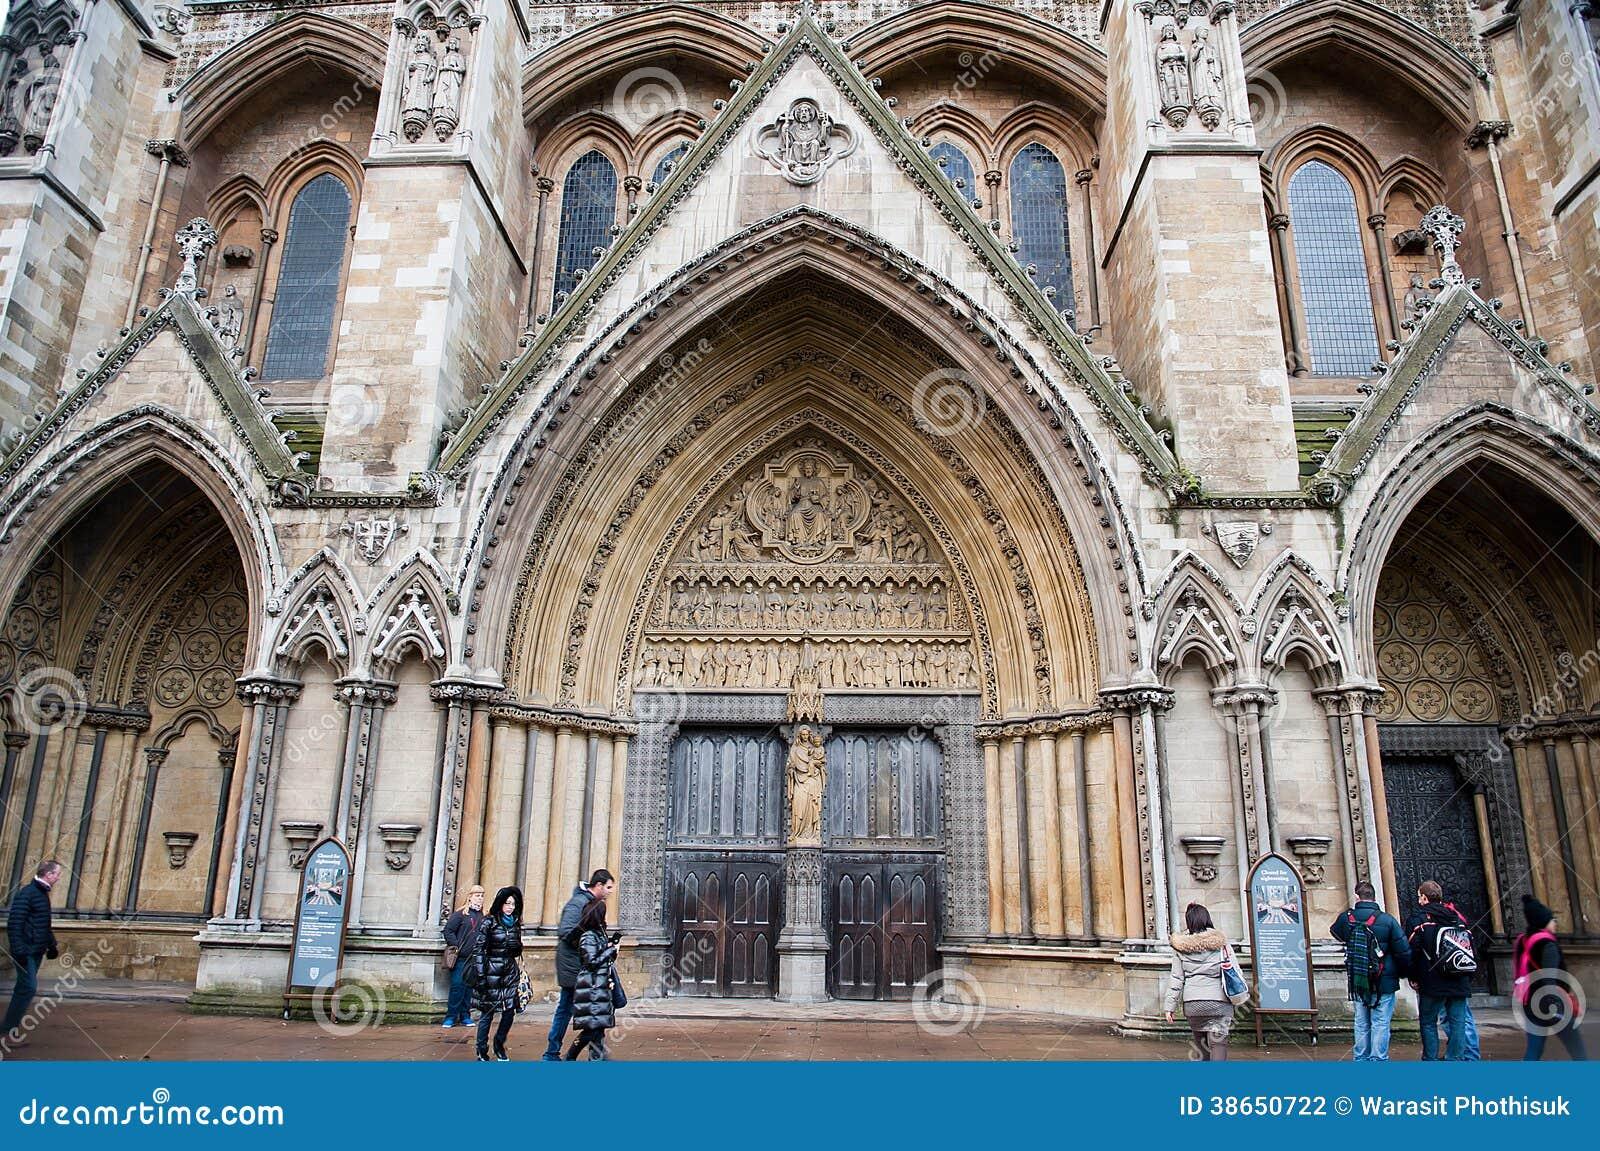 London Church Choir - Christmas Carols